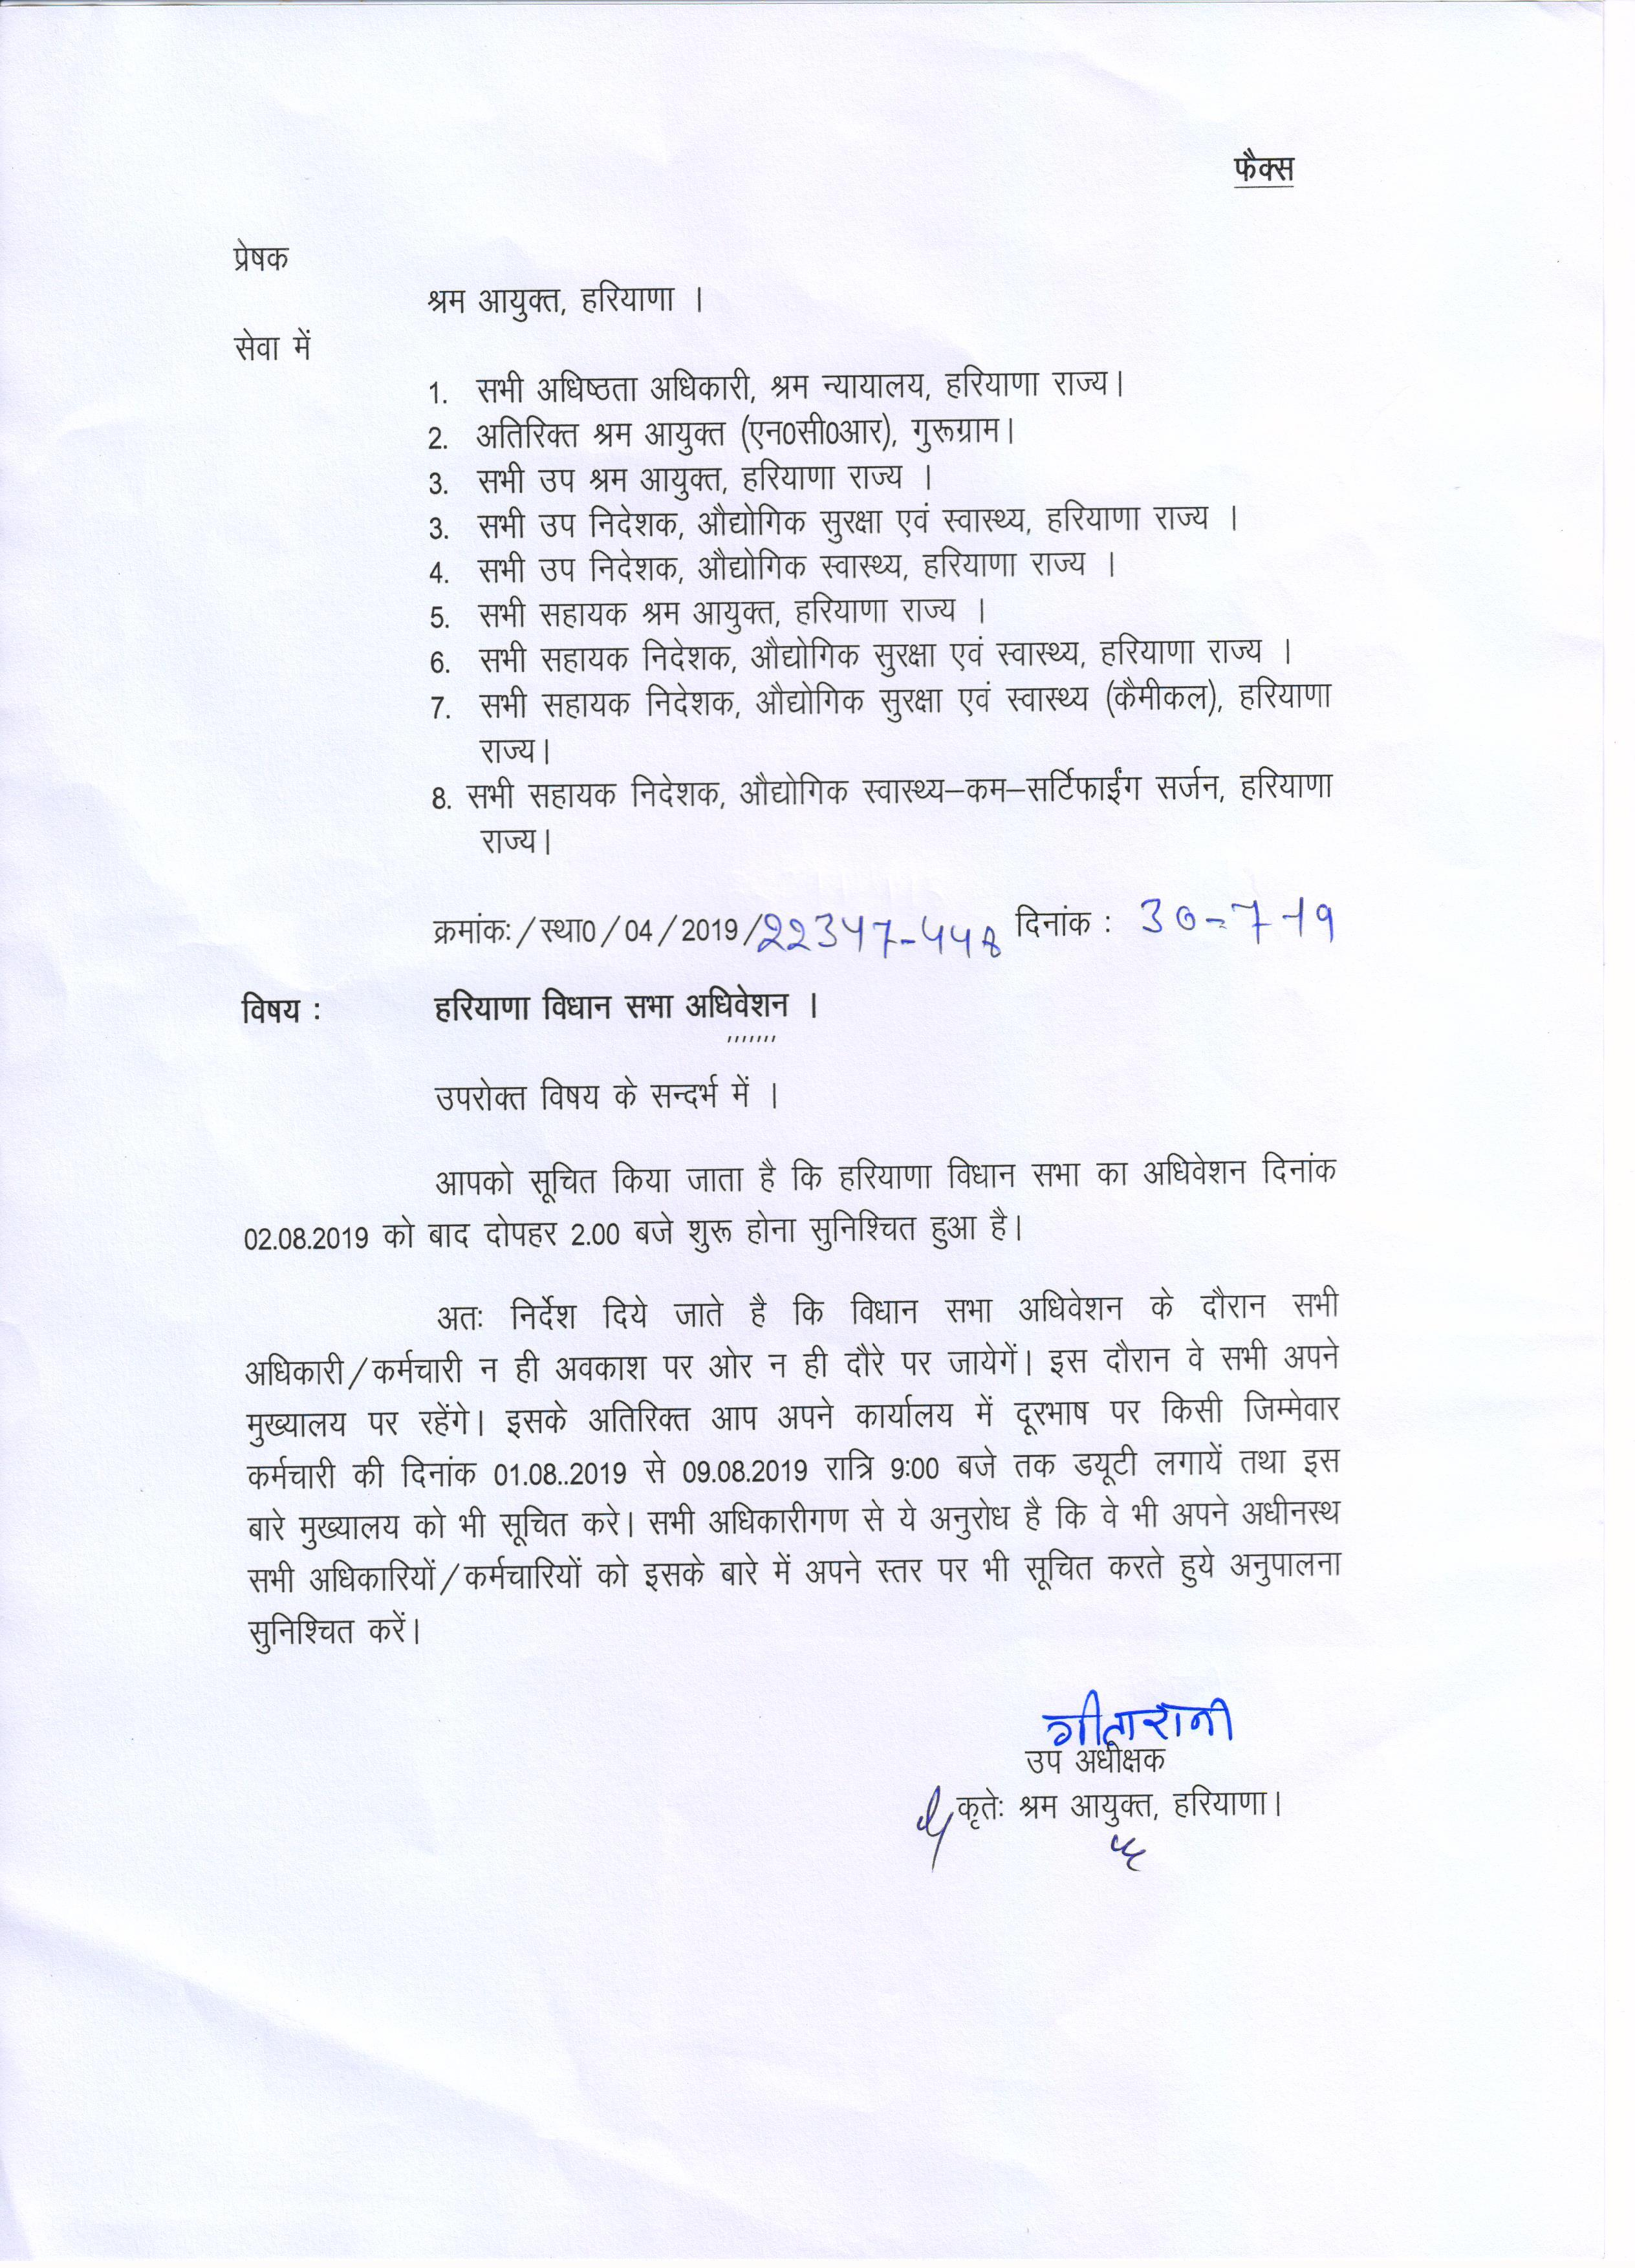 Haryana Labour :: E-Governance Portal